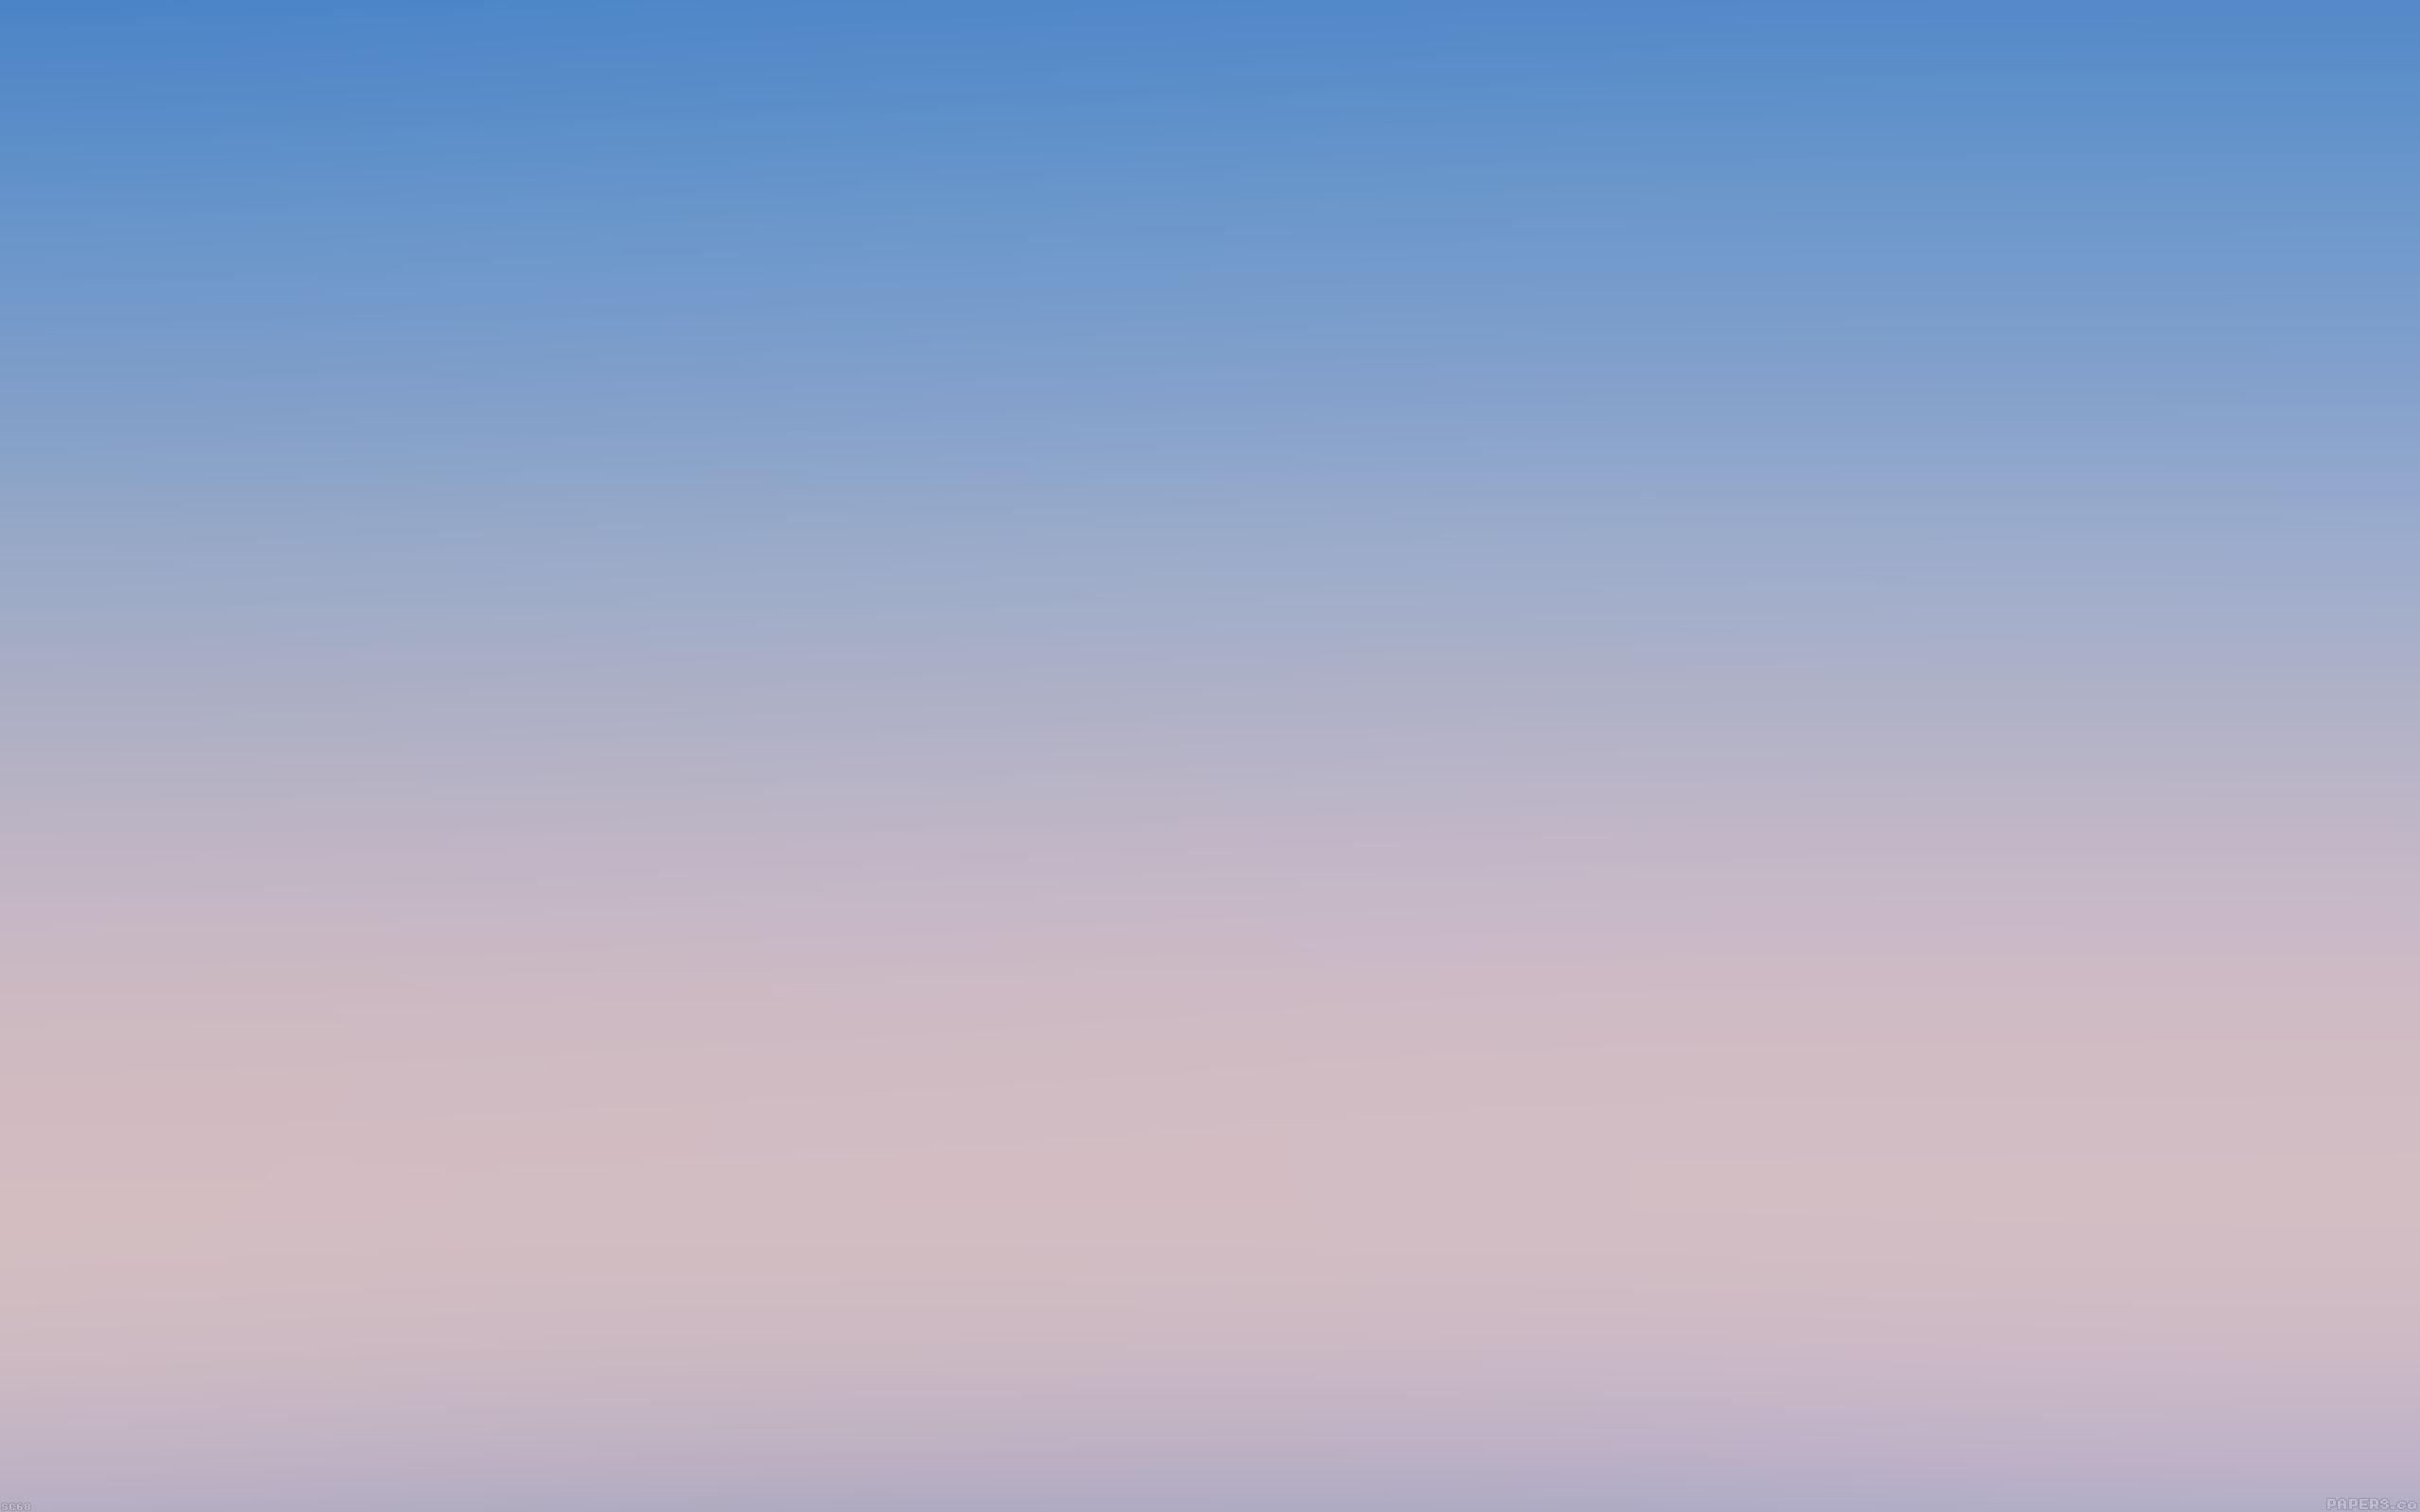 Waikiki Beach Ipad Air Wallpaper: Macbook Pro 13